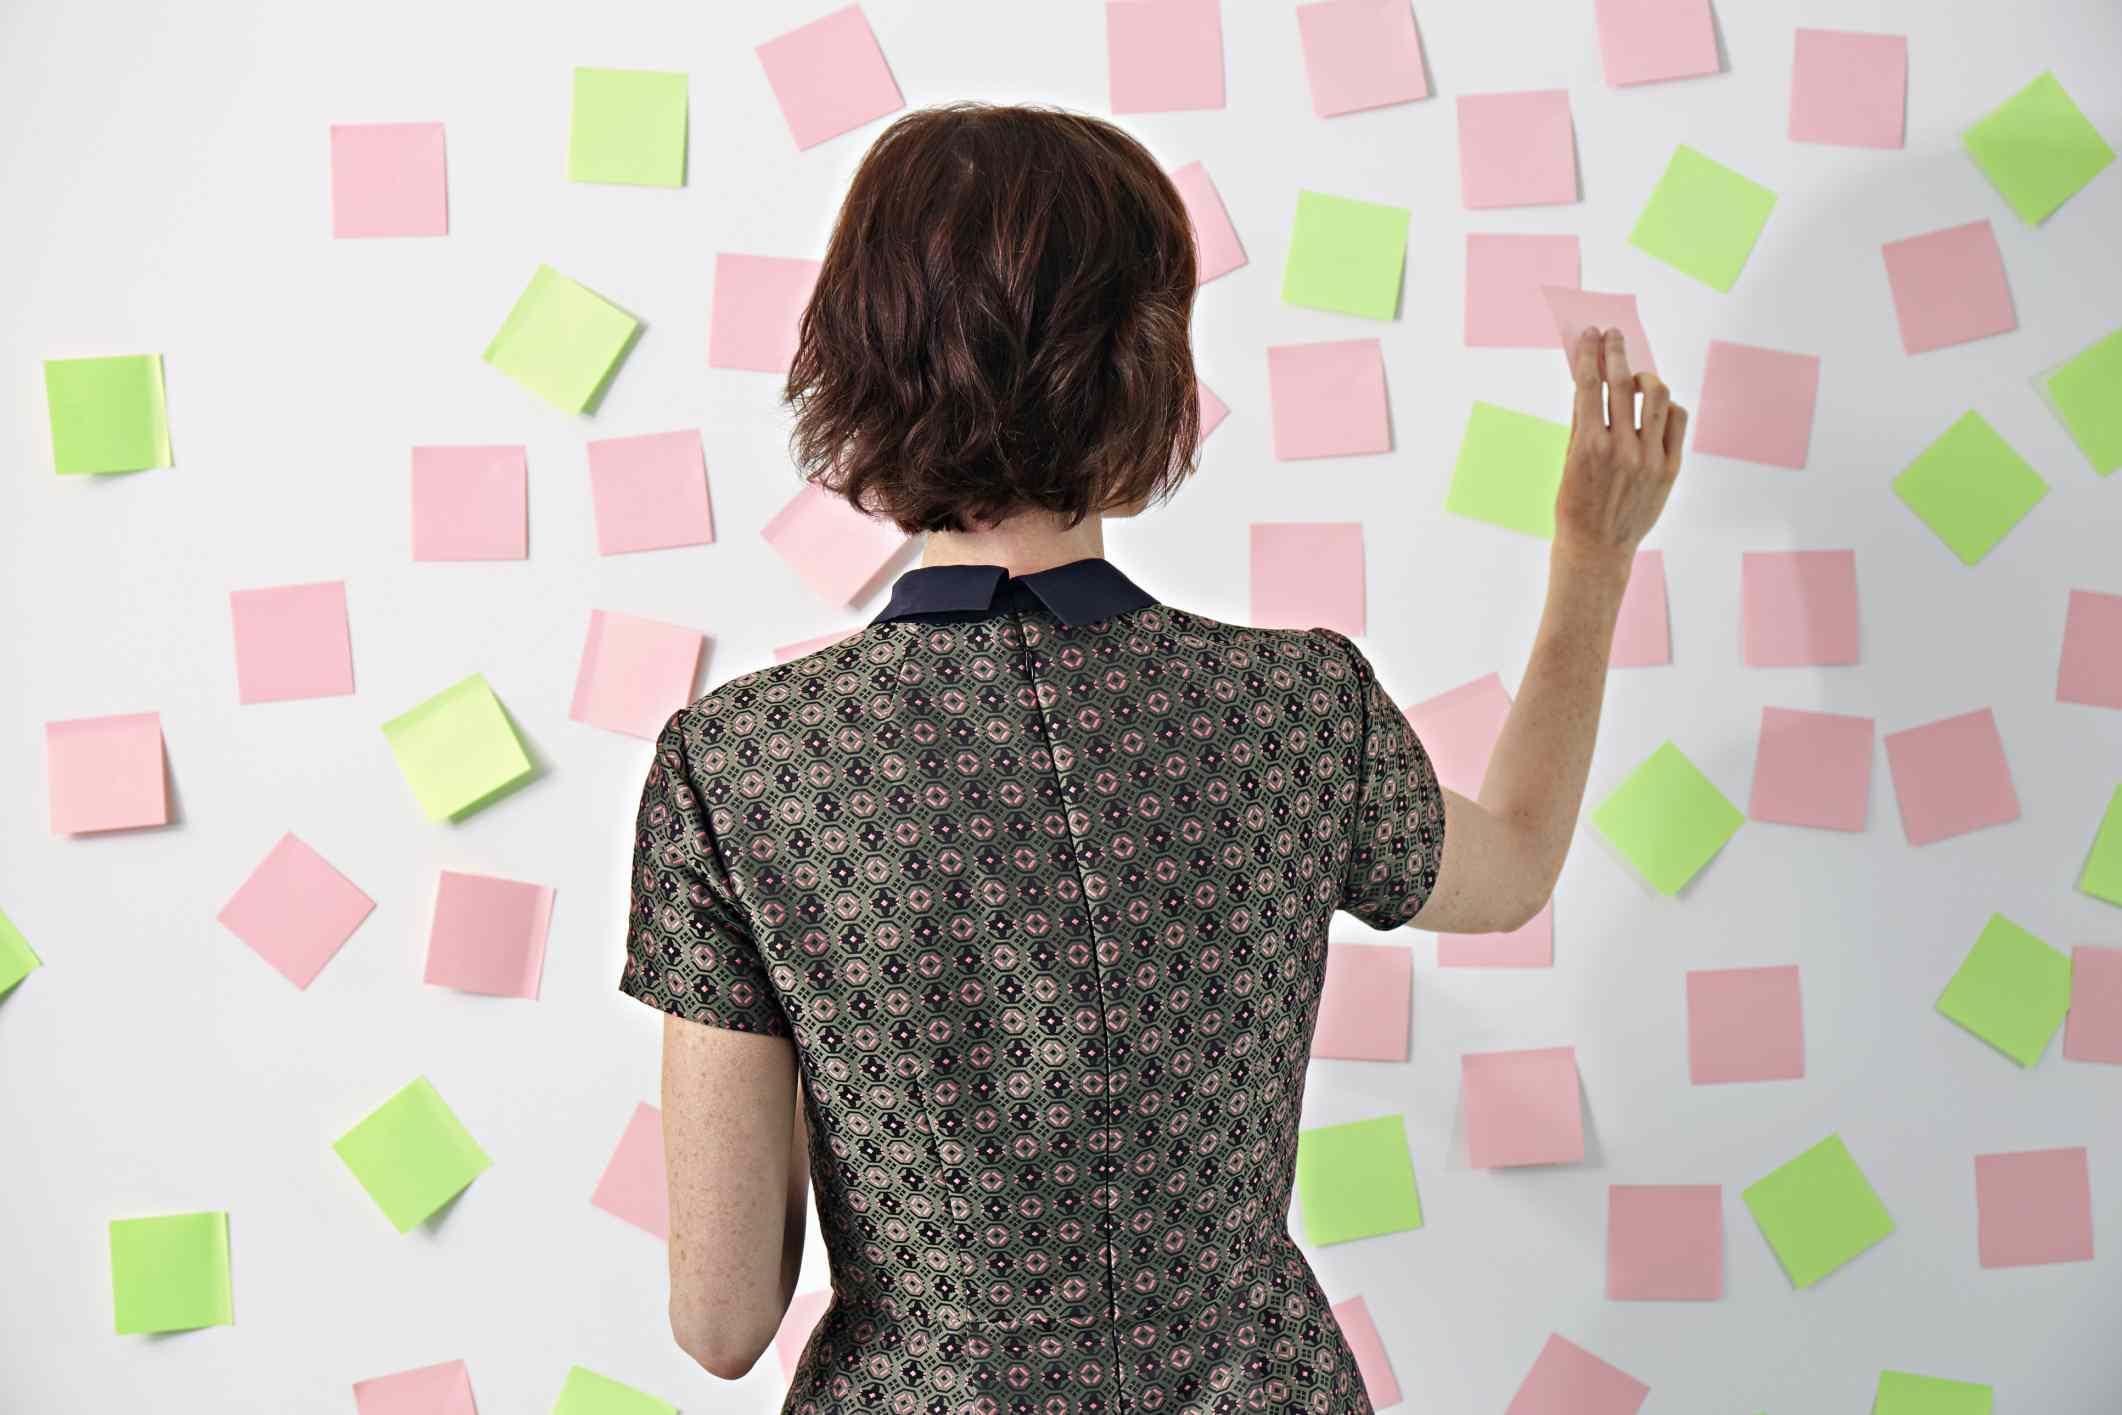 Organize information to improve memory